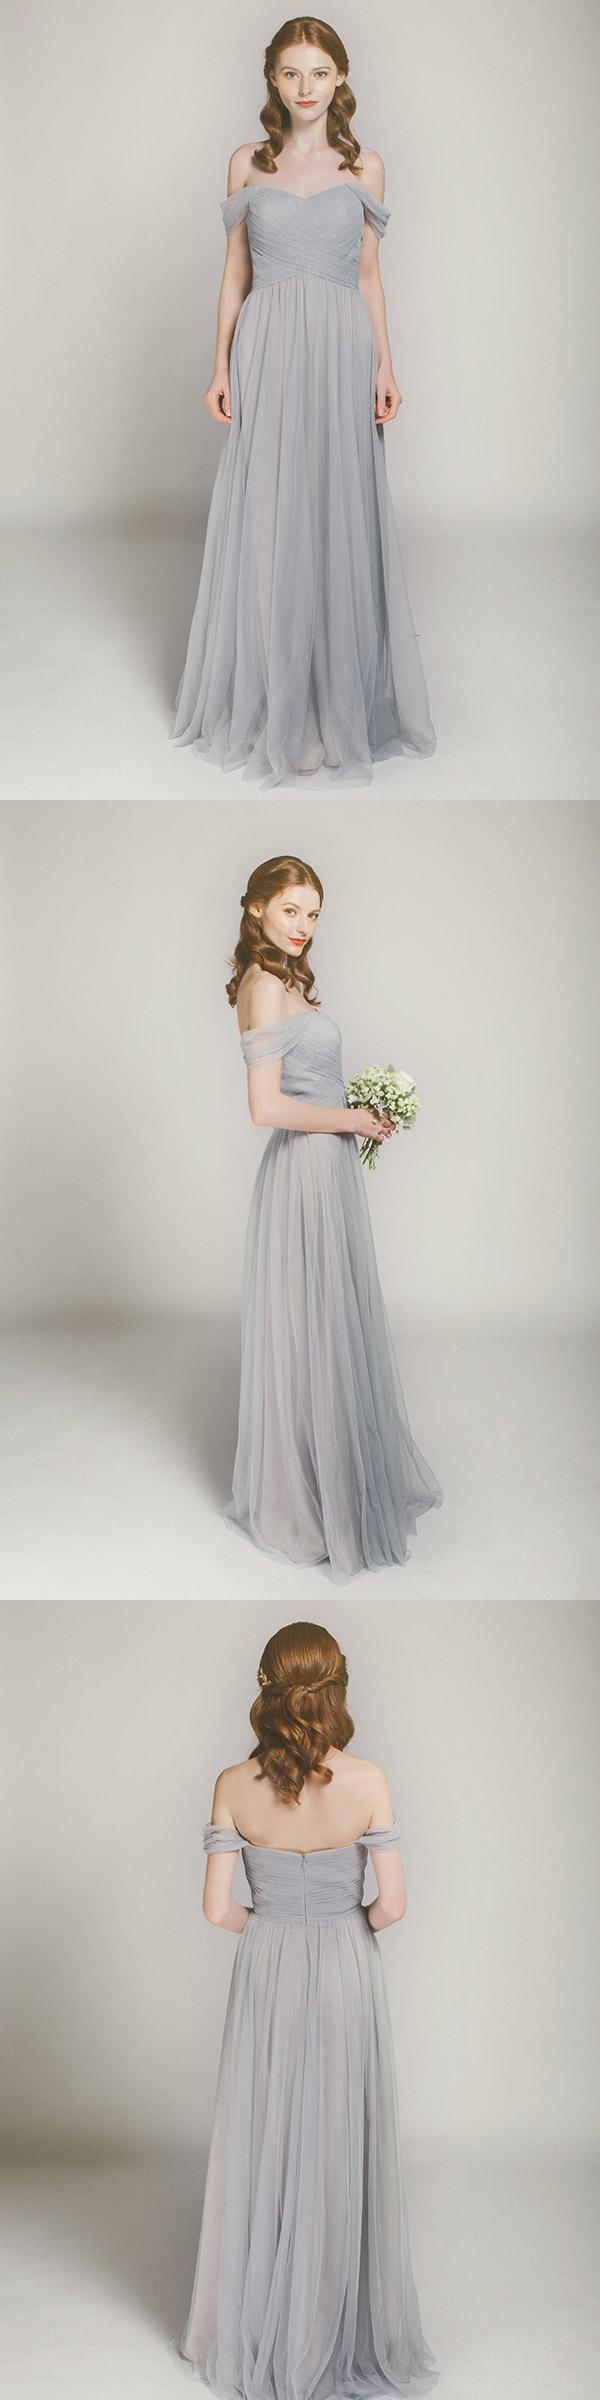 Sky gray long off shoulder tulle bridesmaid dress swbd002 gray sky gray long off shoulder tulle bridesmaid dress swbd002 ombrellifo Gallery